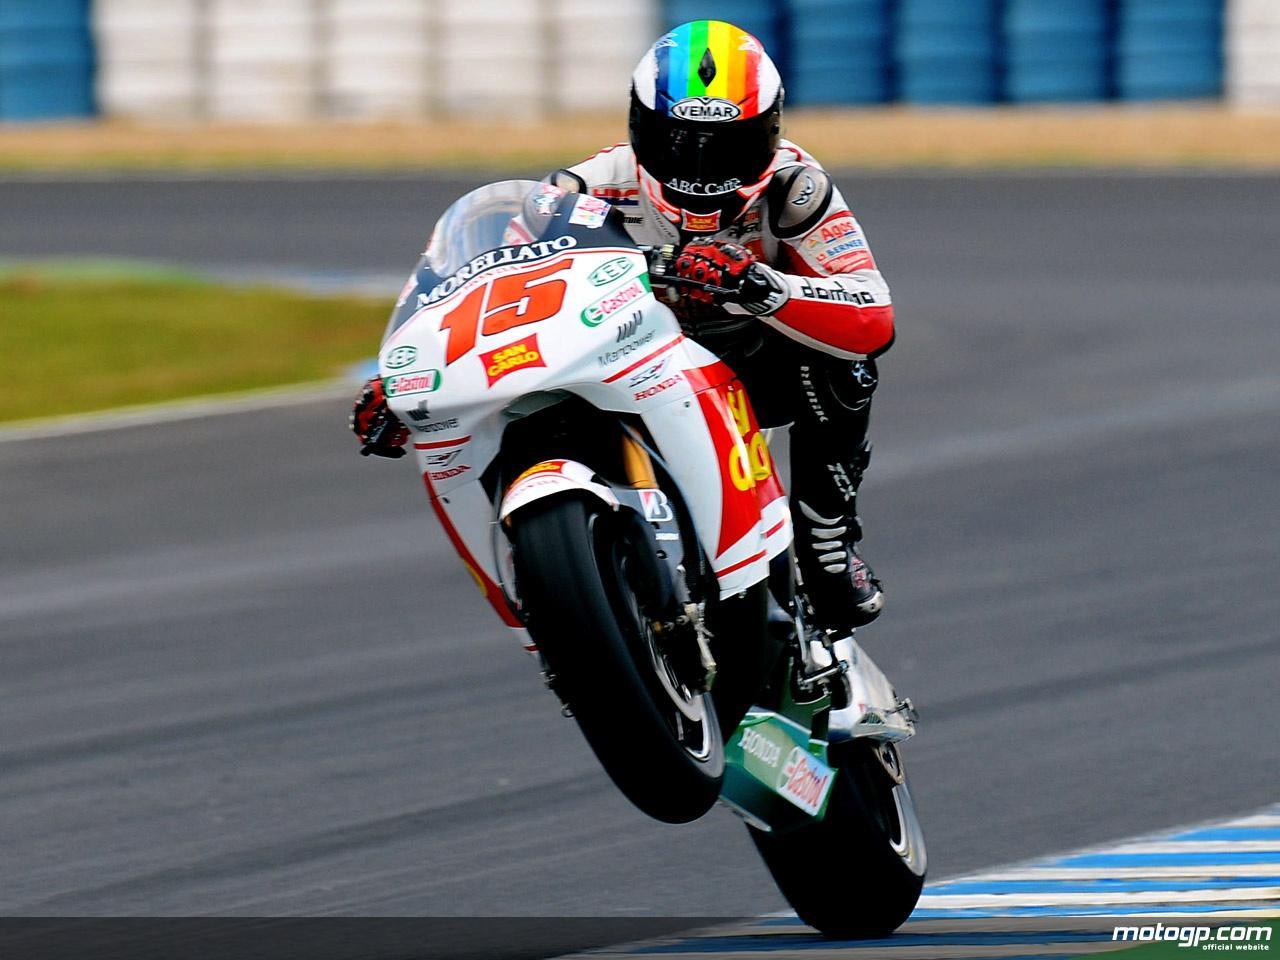 http://3.bp.blogspot.com/_Snt0vejHf5Y/TLGQWPfaP4I/AAAAAAAAARU/stXe_OuqjNw/s1600/n495800_236333_Alex+de+Angelis+in+MotoGP+test+in+Jerez-1280x960-nov27.jpg._original.original.jpg